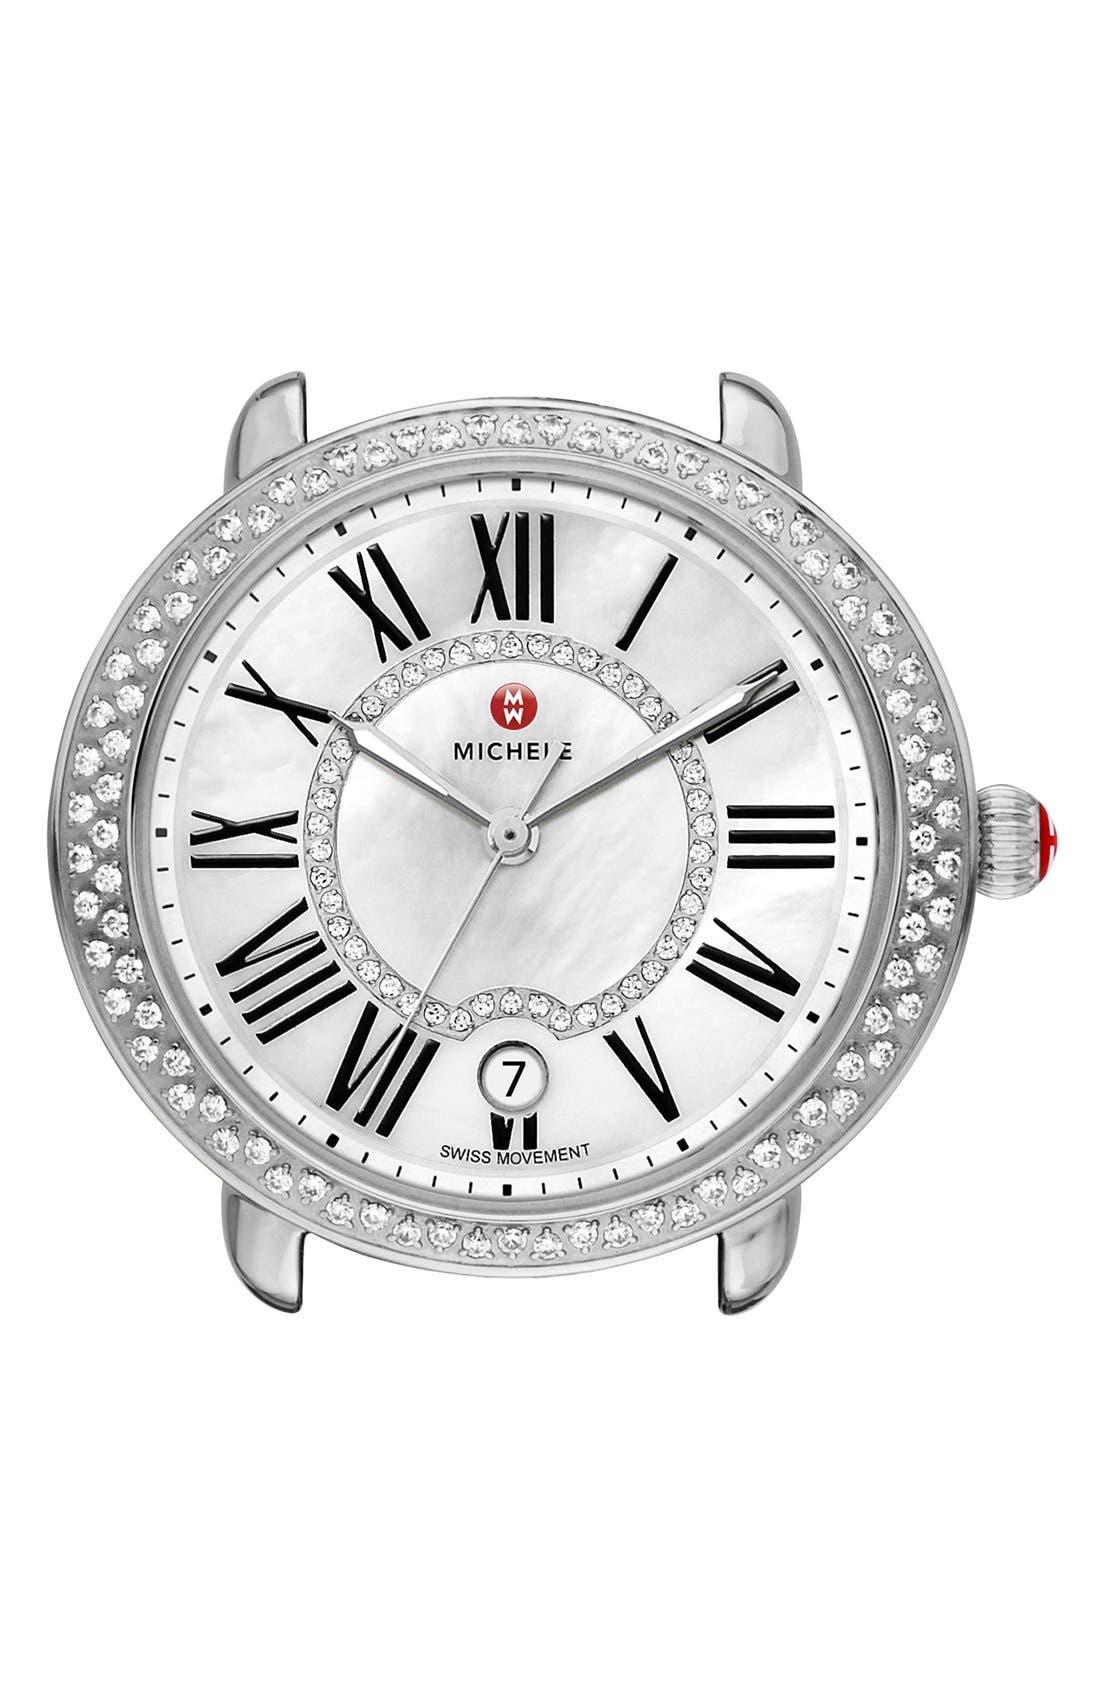 Serein 16 Diamond Watch Case, 34mm x 36mm,                         Main,                         color, Silver/ White